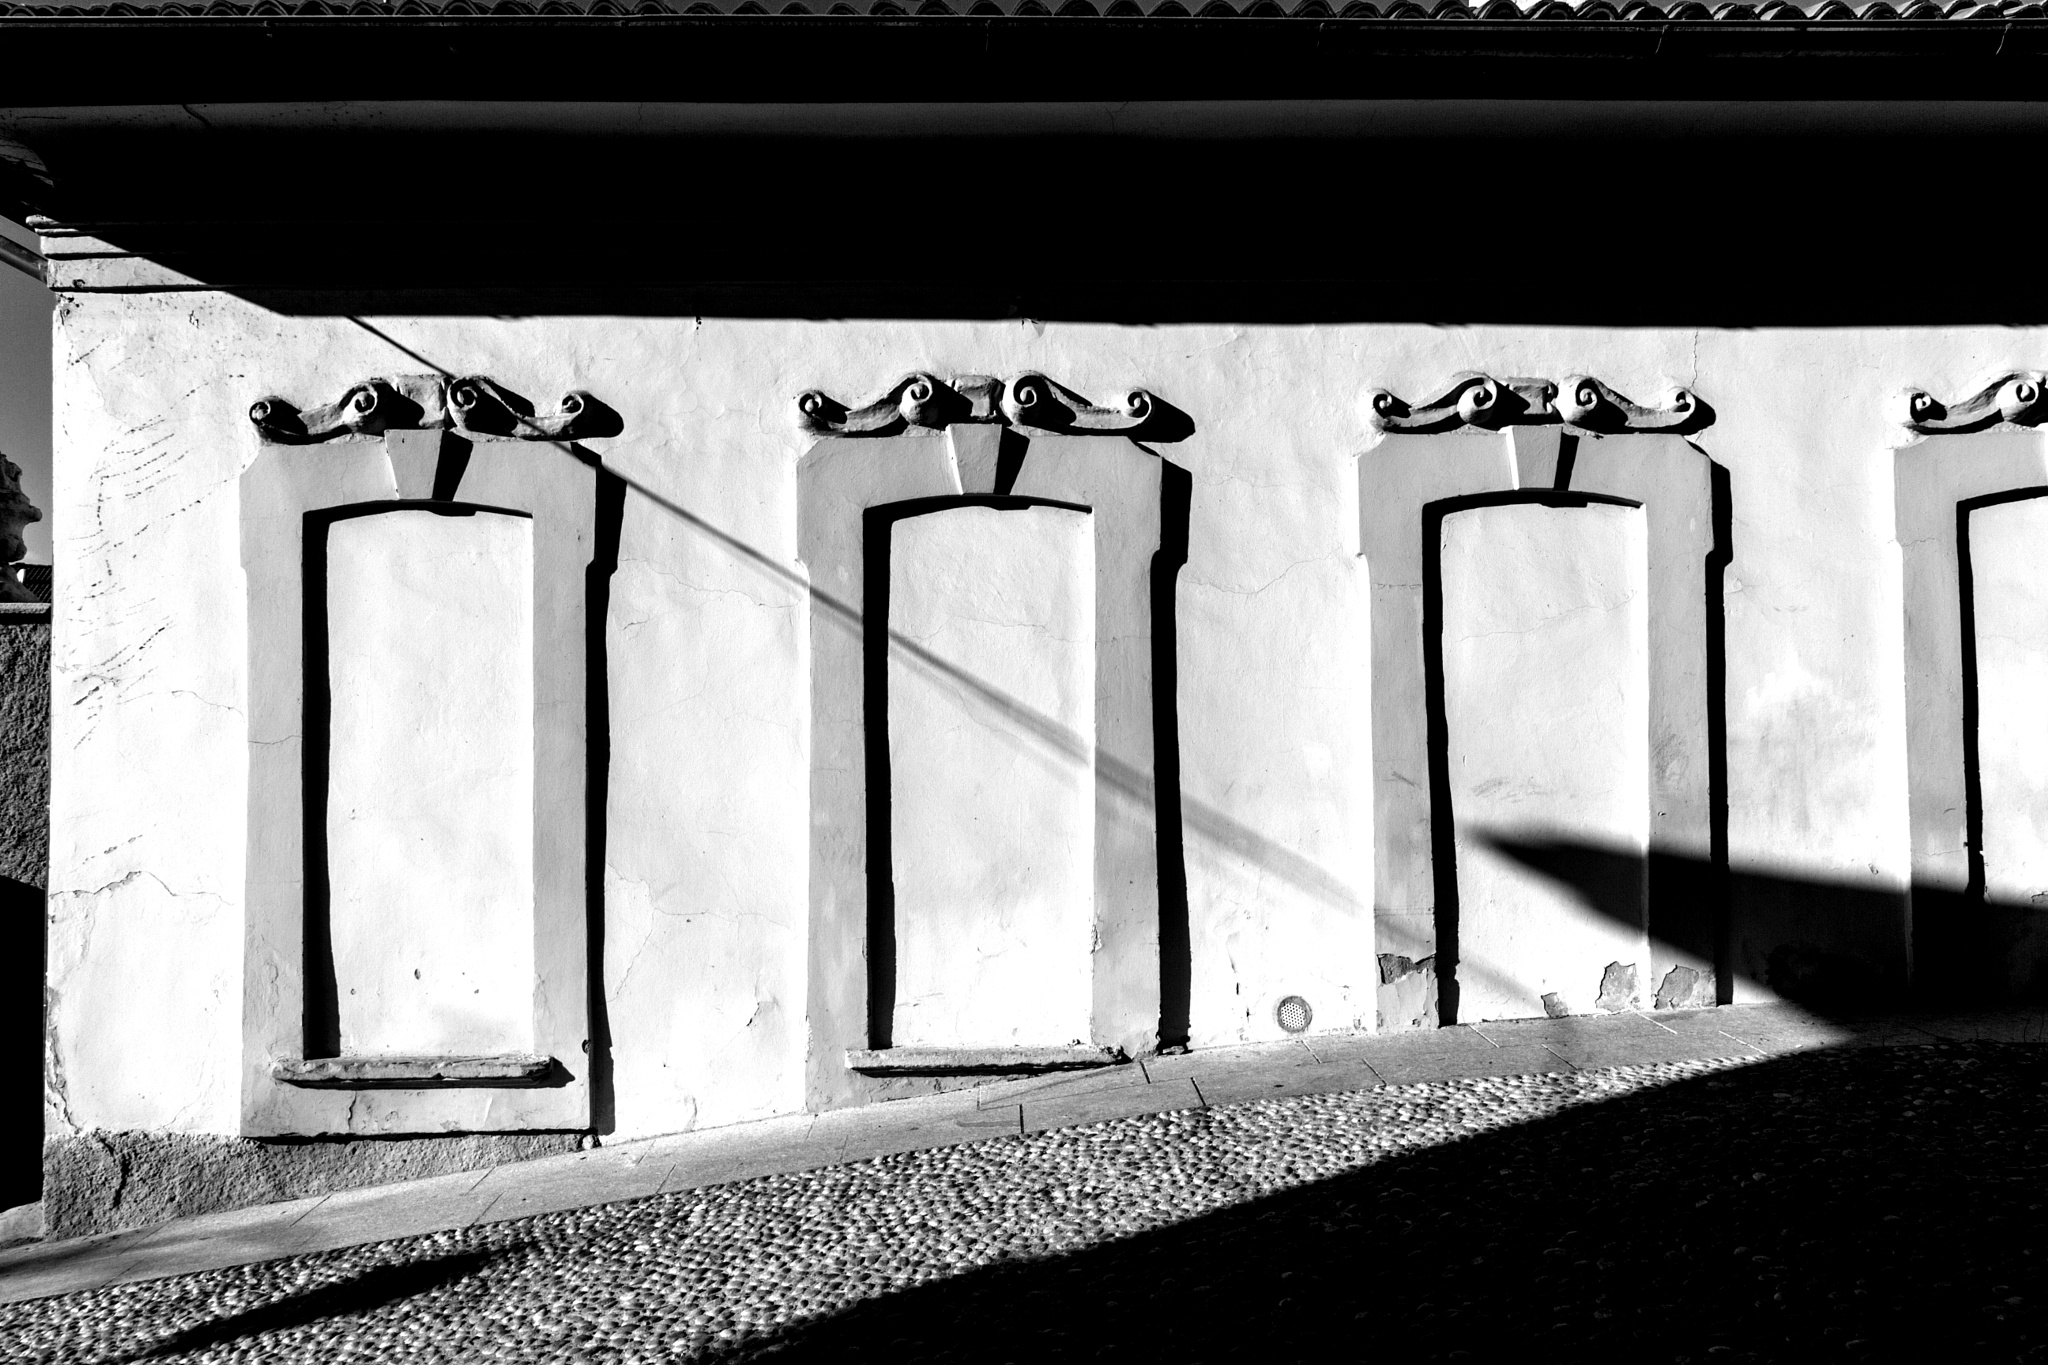 Montevecchia by Storvandre Photography